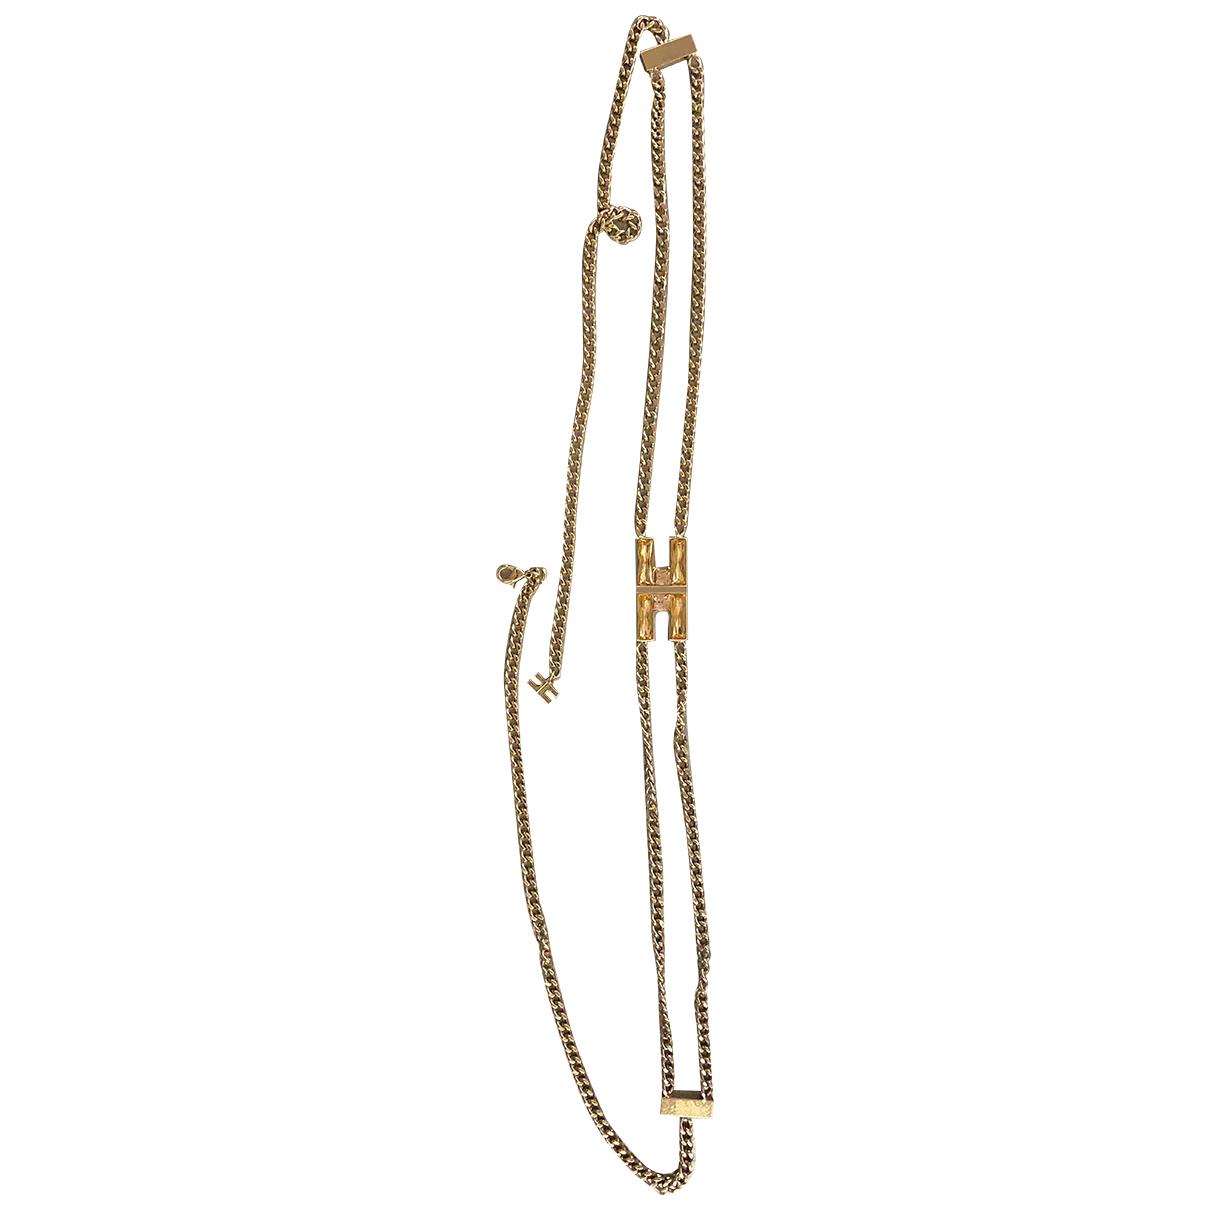 Elisabetta Franchi N Gold Chain belt.Suspenders for Kids N